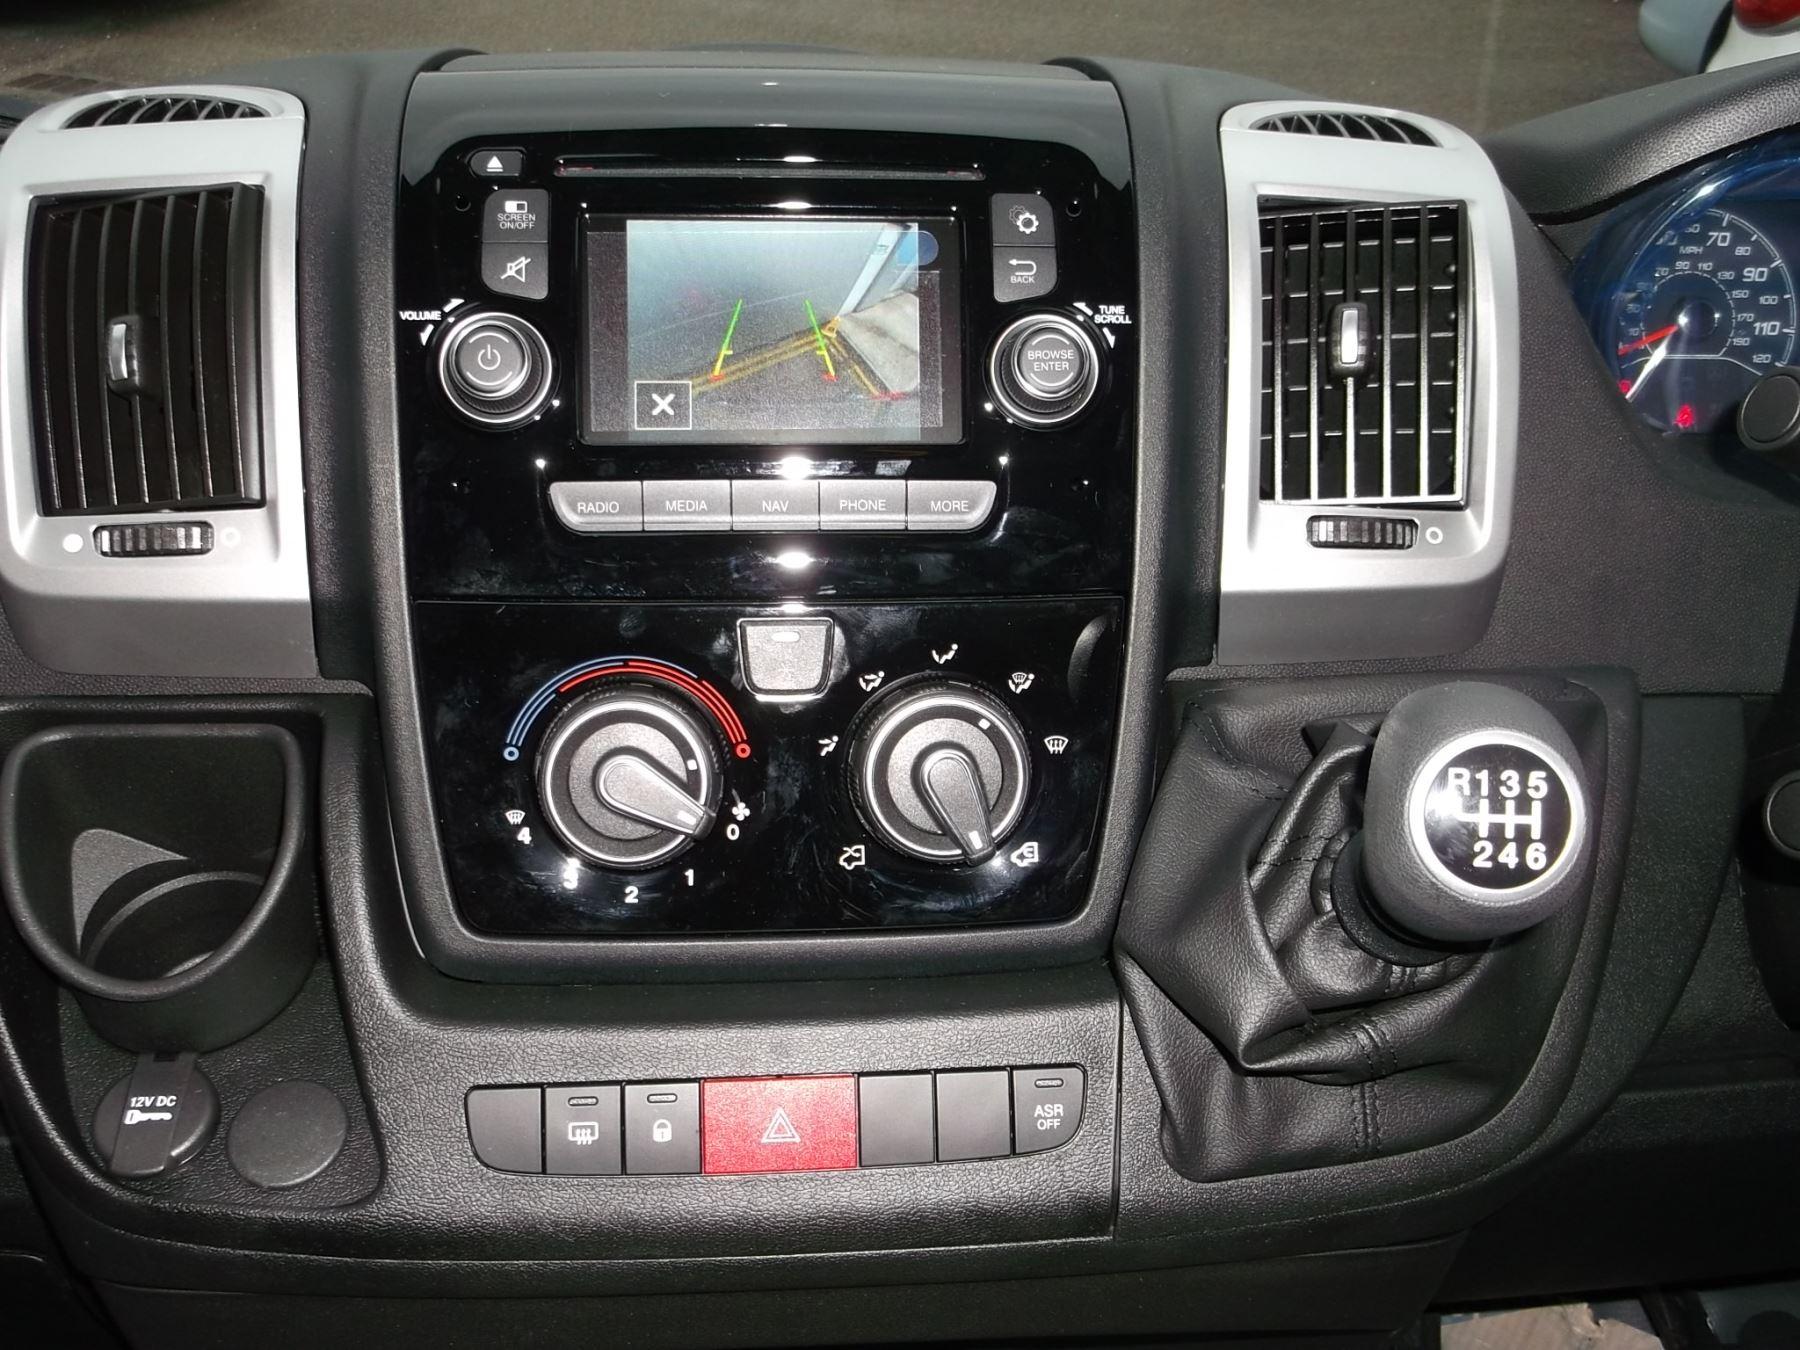 Fiat Ducato MWB HR 2.3 160 SPORTIVO MY20 ALLOYS CLR CODED LED  AIRCON NAV CRUISE REV SENSORS CAMERA image 10